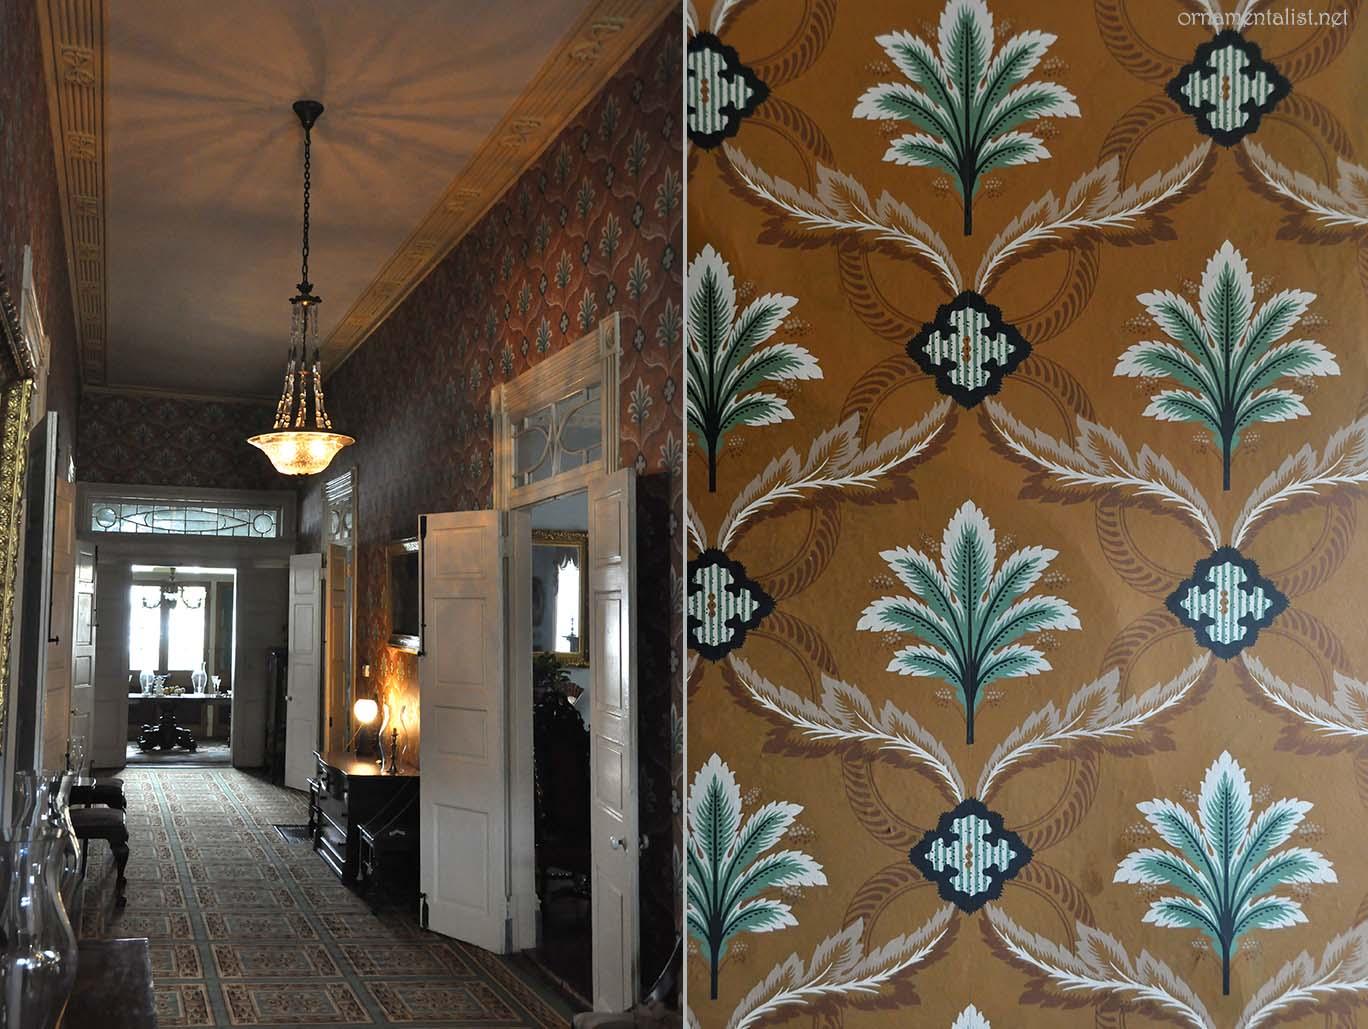 The Ornamentalist Modern Wallpaper of the 19th Century 1368x1029